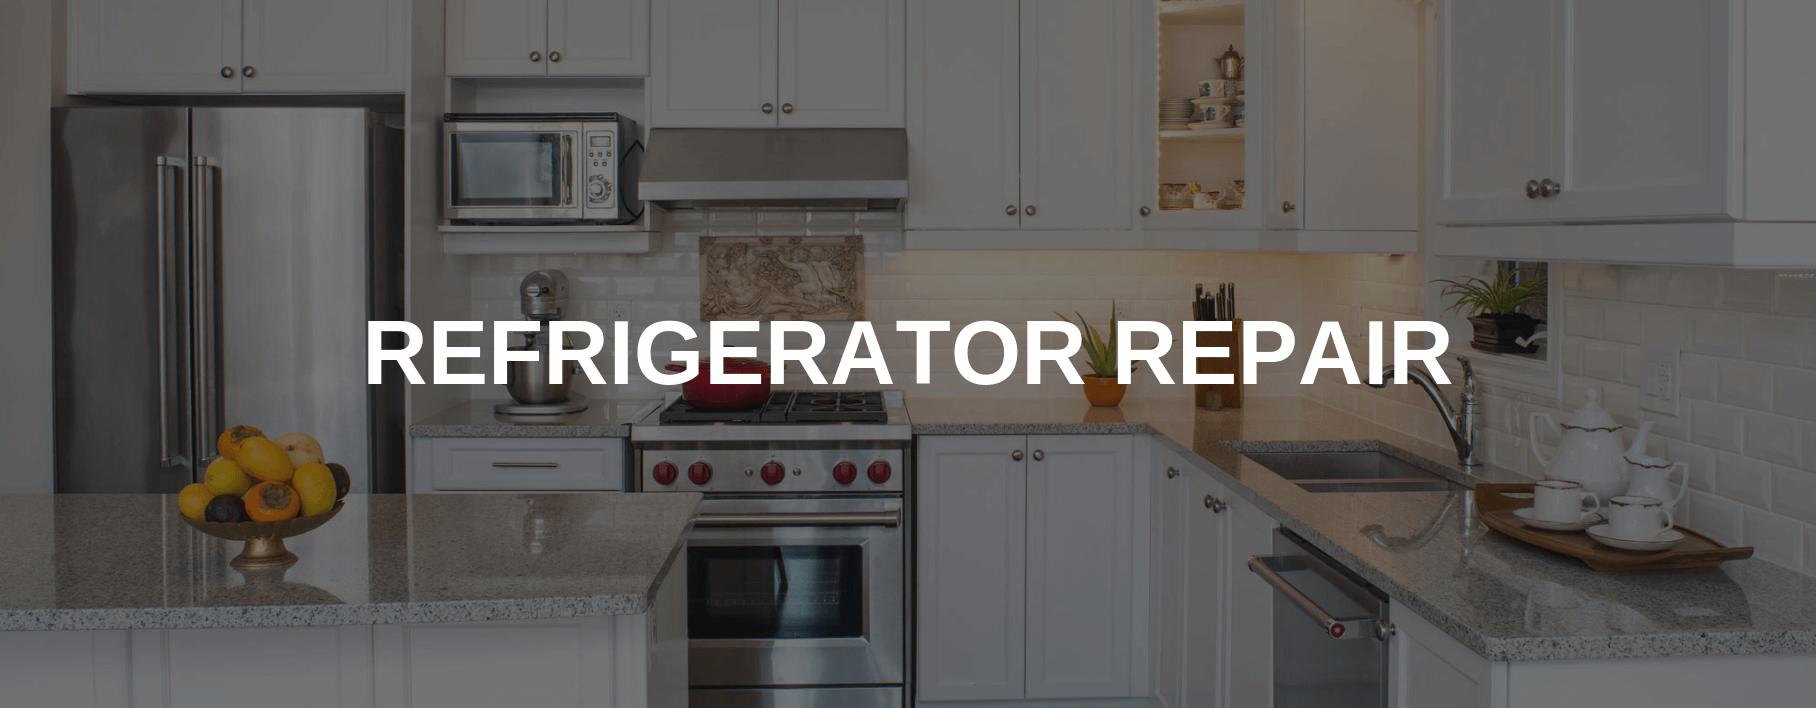 refrigerator repair naugatuck